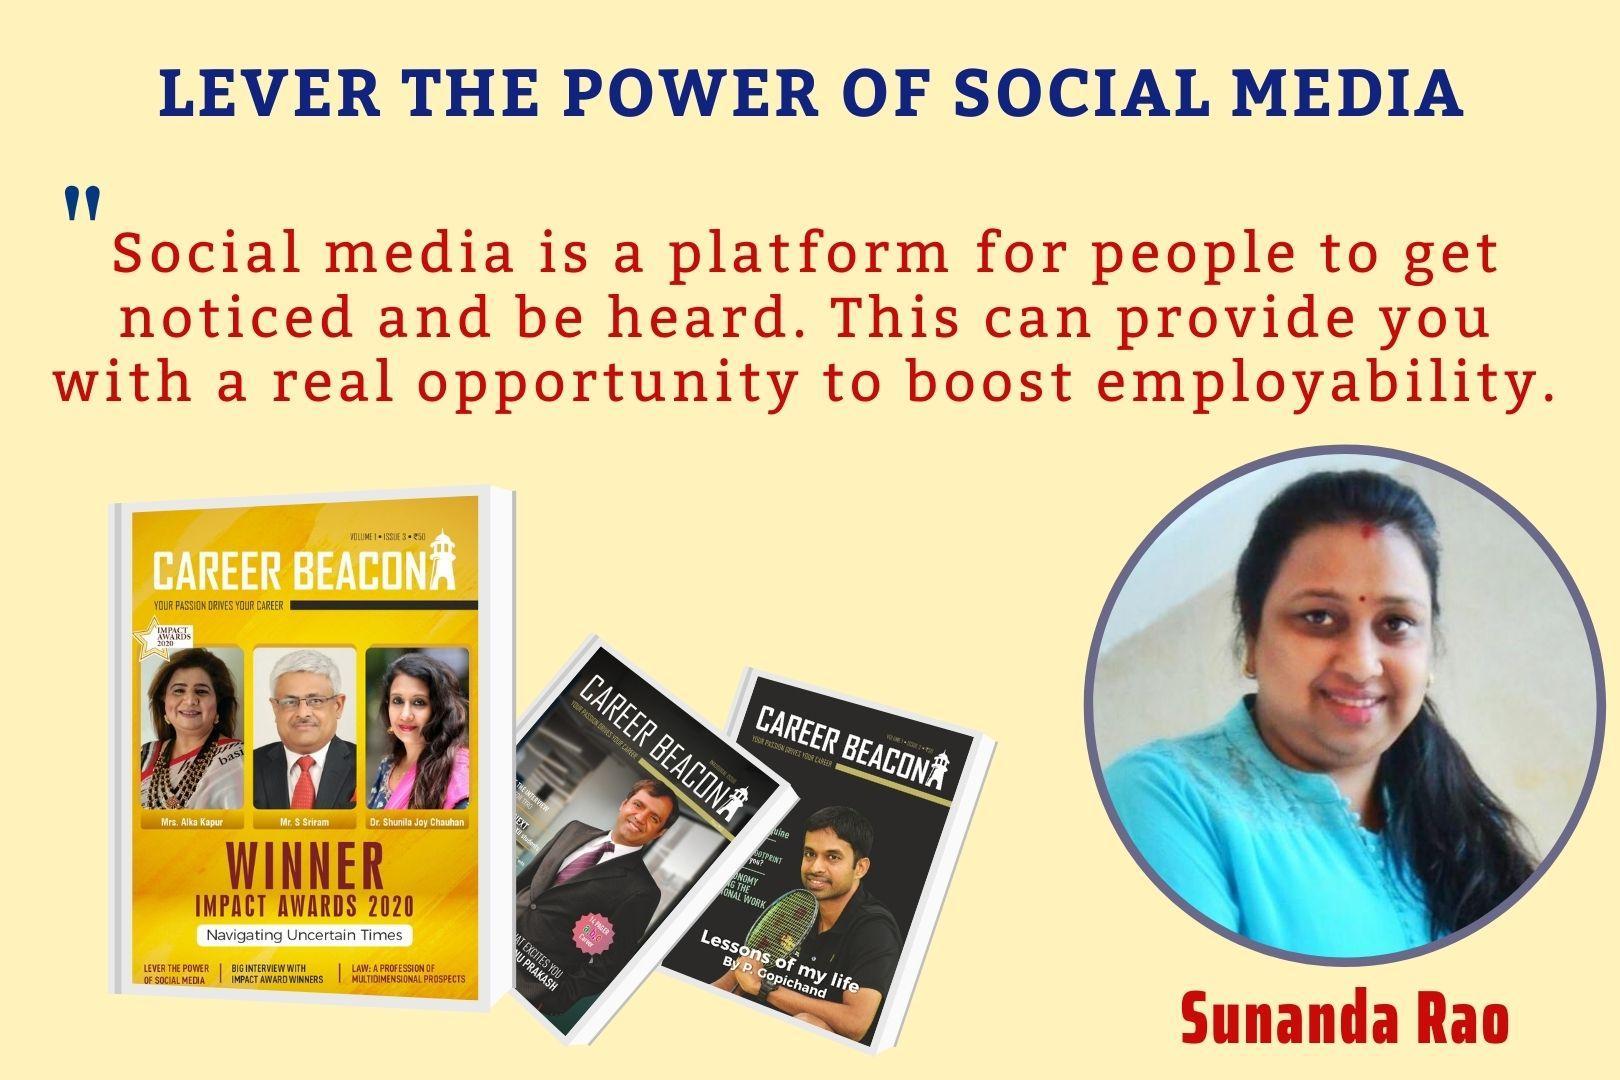 LEVER THE POWER OF SOCIAL MEDIA